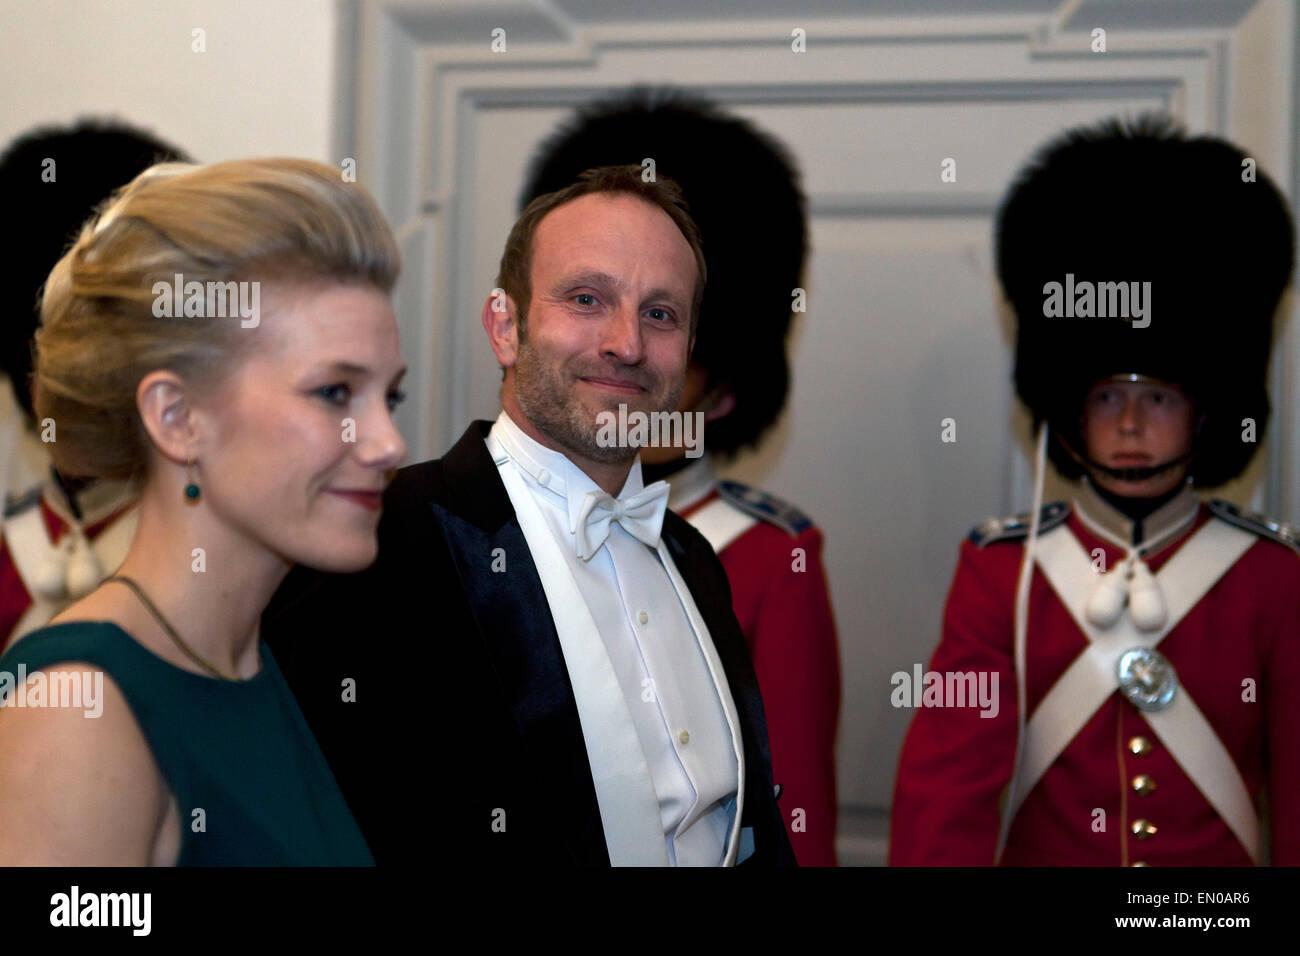 Copenhagen, Denmark, April15th, 2015. Foreign Minister, Mr. Martin Lidegaard and wife, arrive to Christiansborg - Stock Image